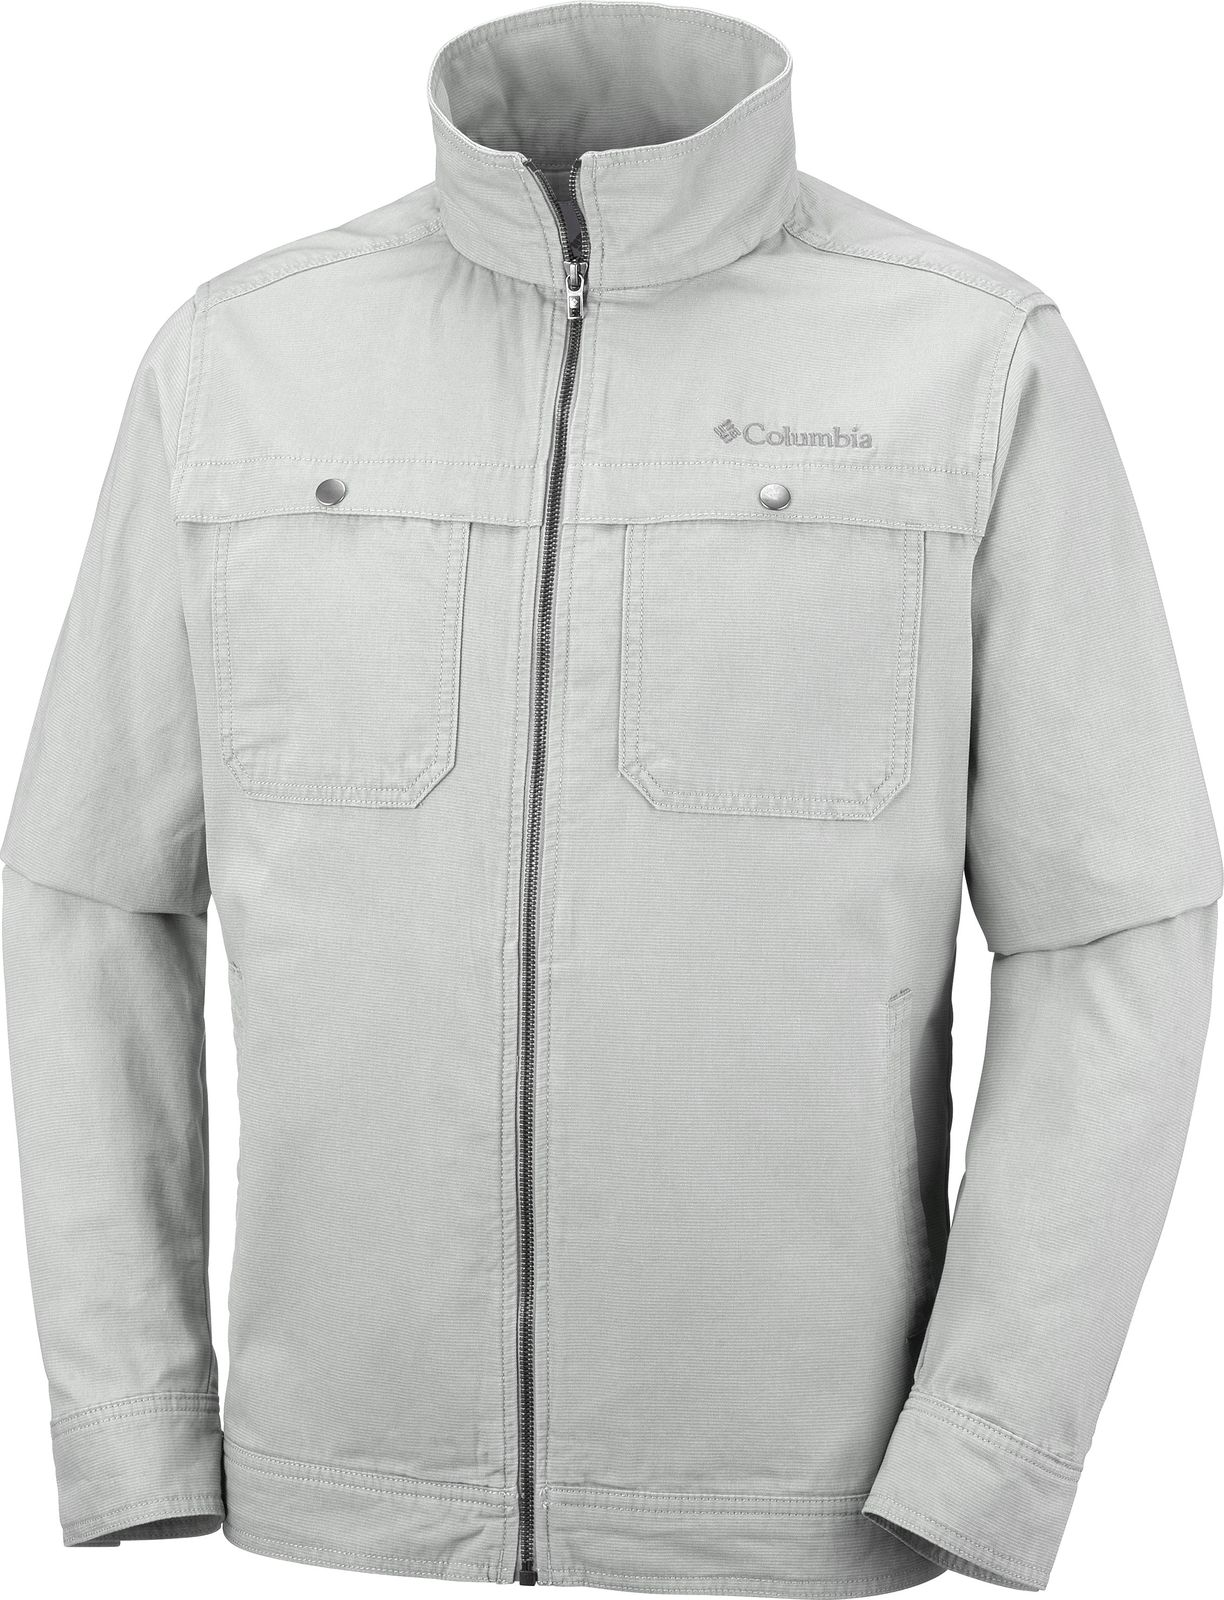 Ветровка Columbia Tolmie Butte Jacket ветровка мужская columbia tolmie butte jacket цвет черный 1771522 011 размер m 46 48